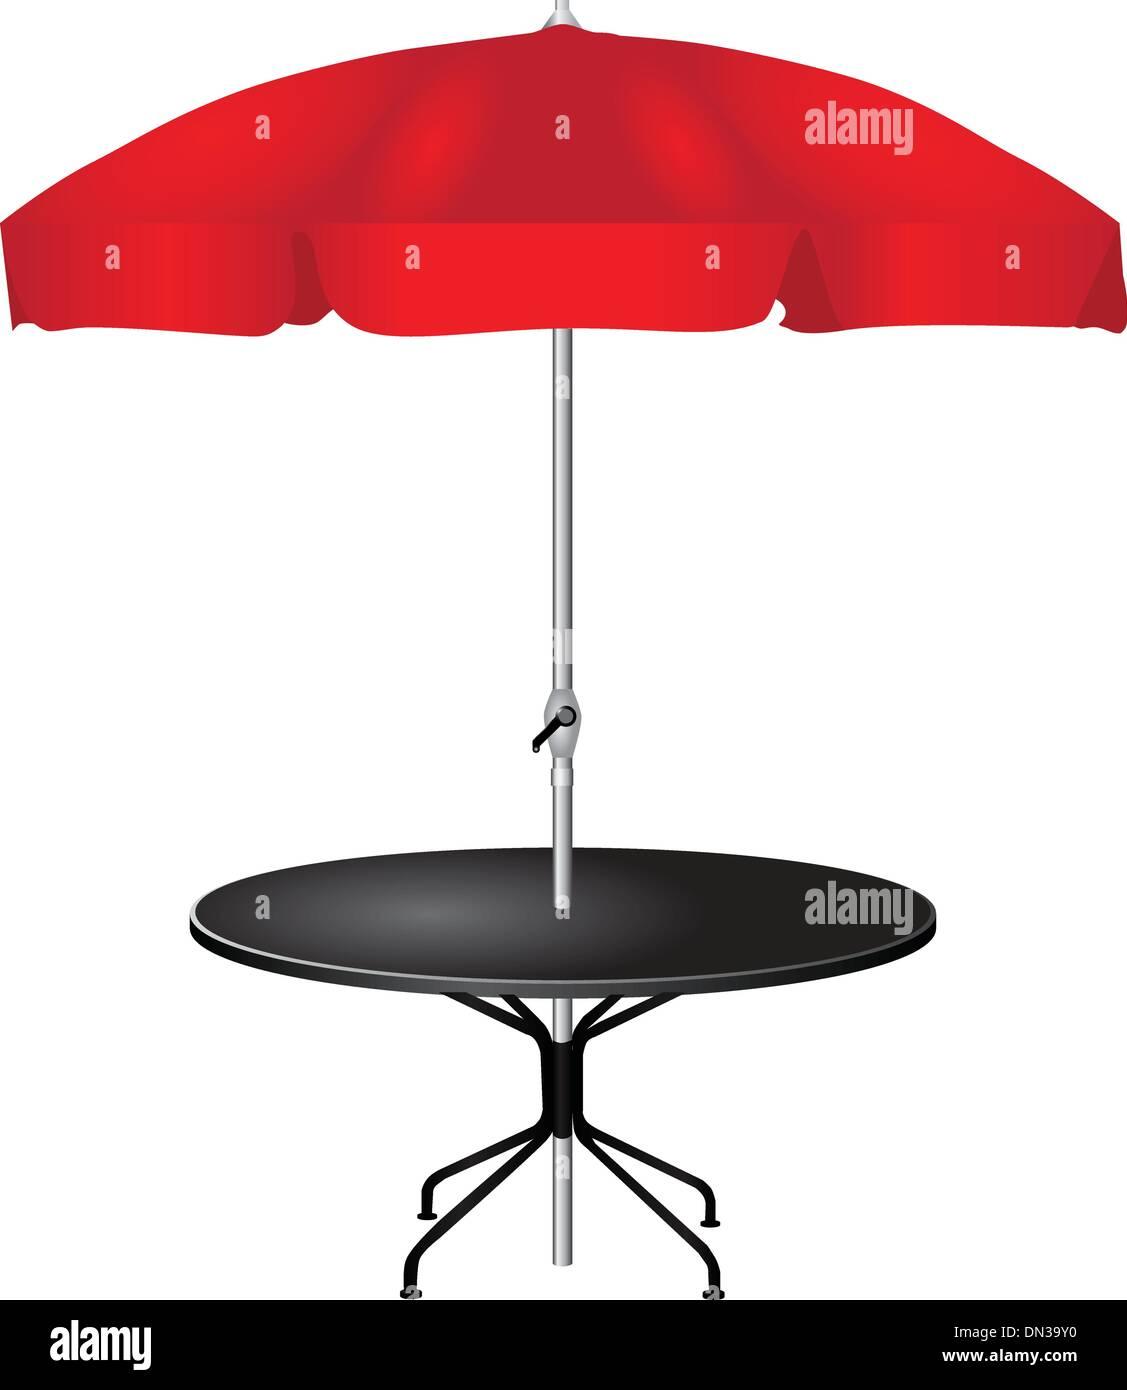 Outdoor coffee table - Stock Vector